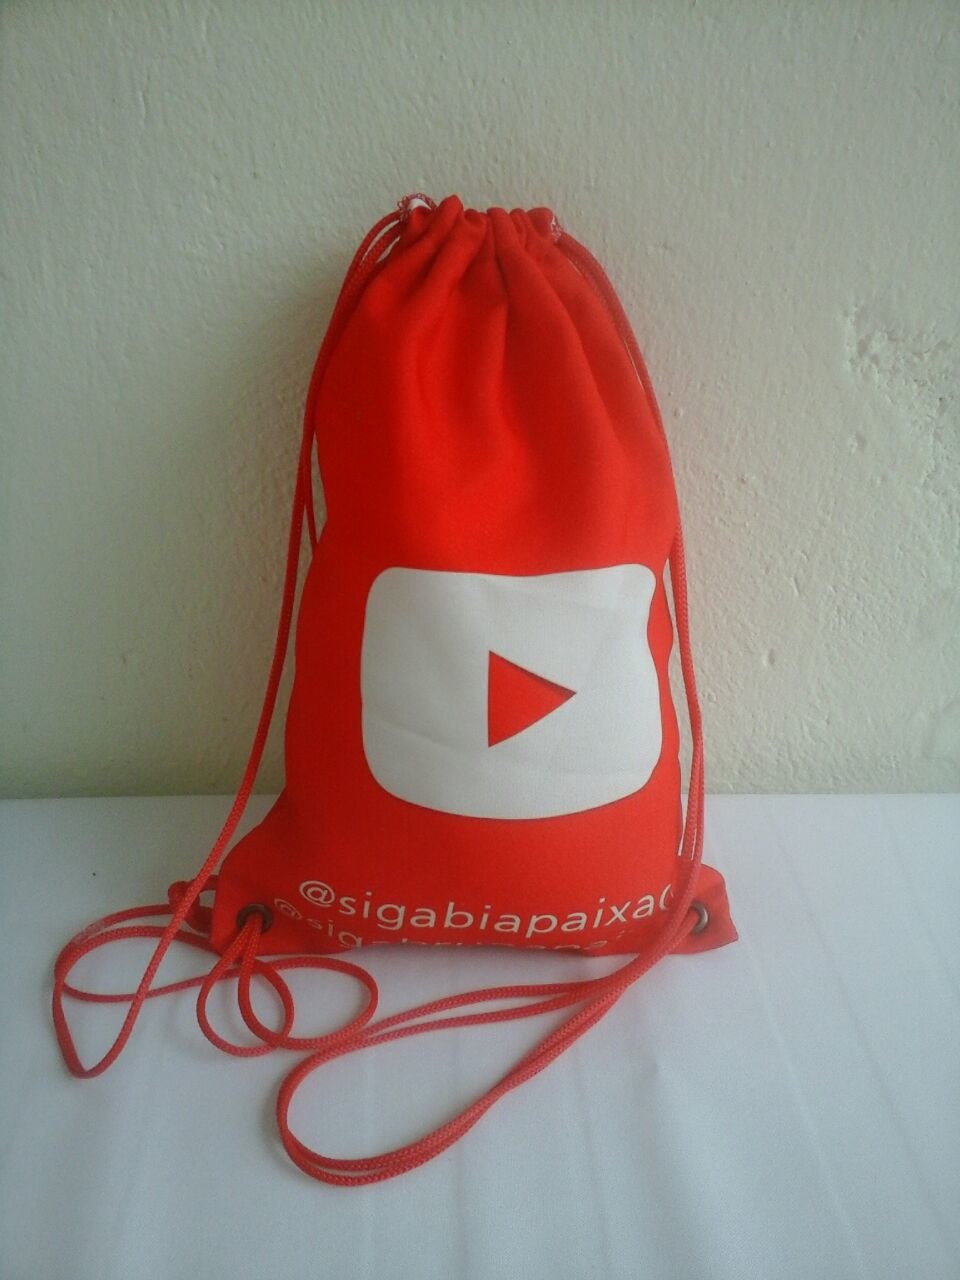 aa915f4b2 Sacochila mochila saco 19x27cm kit com 70 unidades no Elo7   Vilma  lembrancinhas (C6E07D)